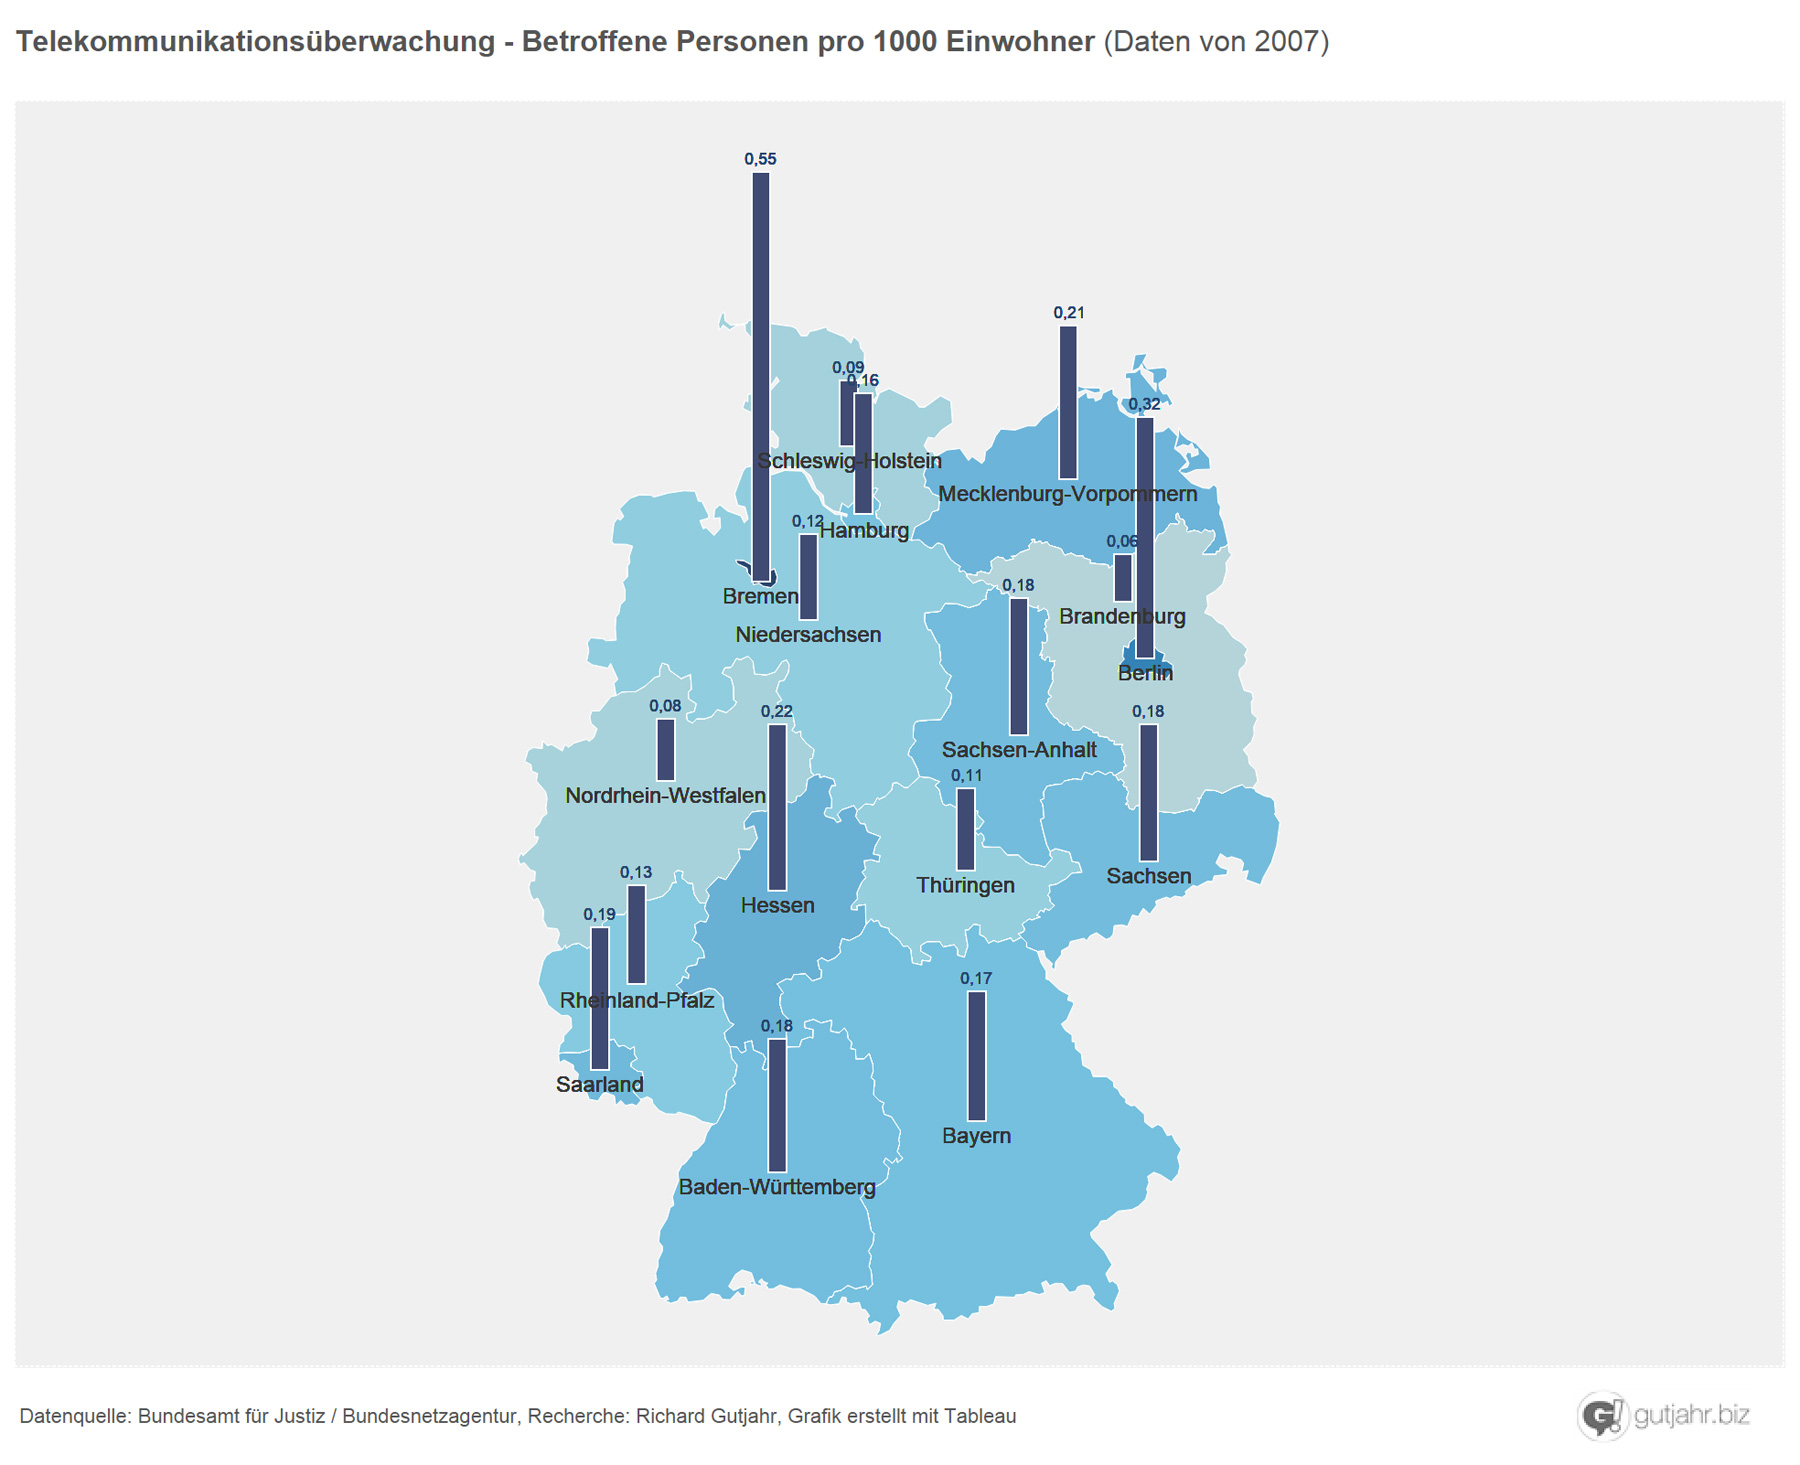 Ueberwachung_Statistik3